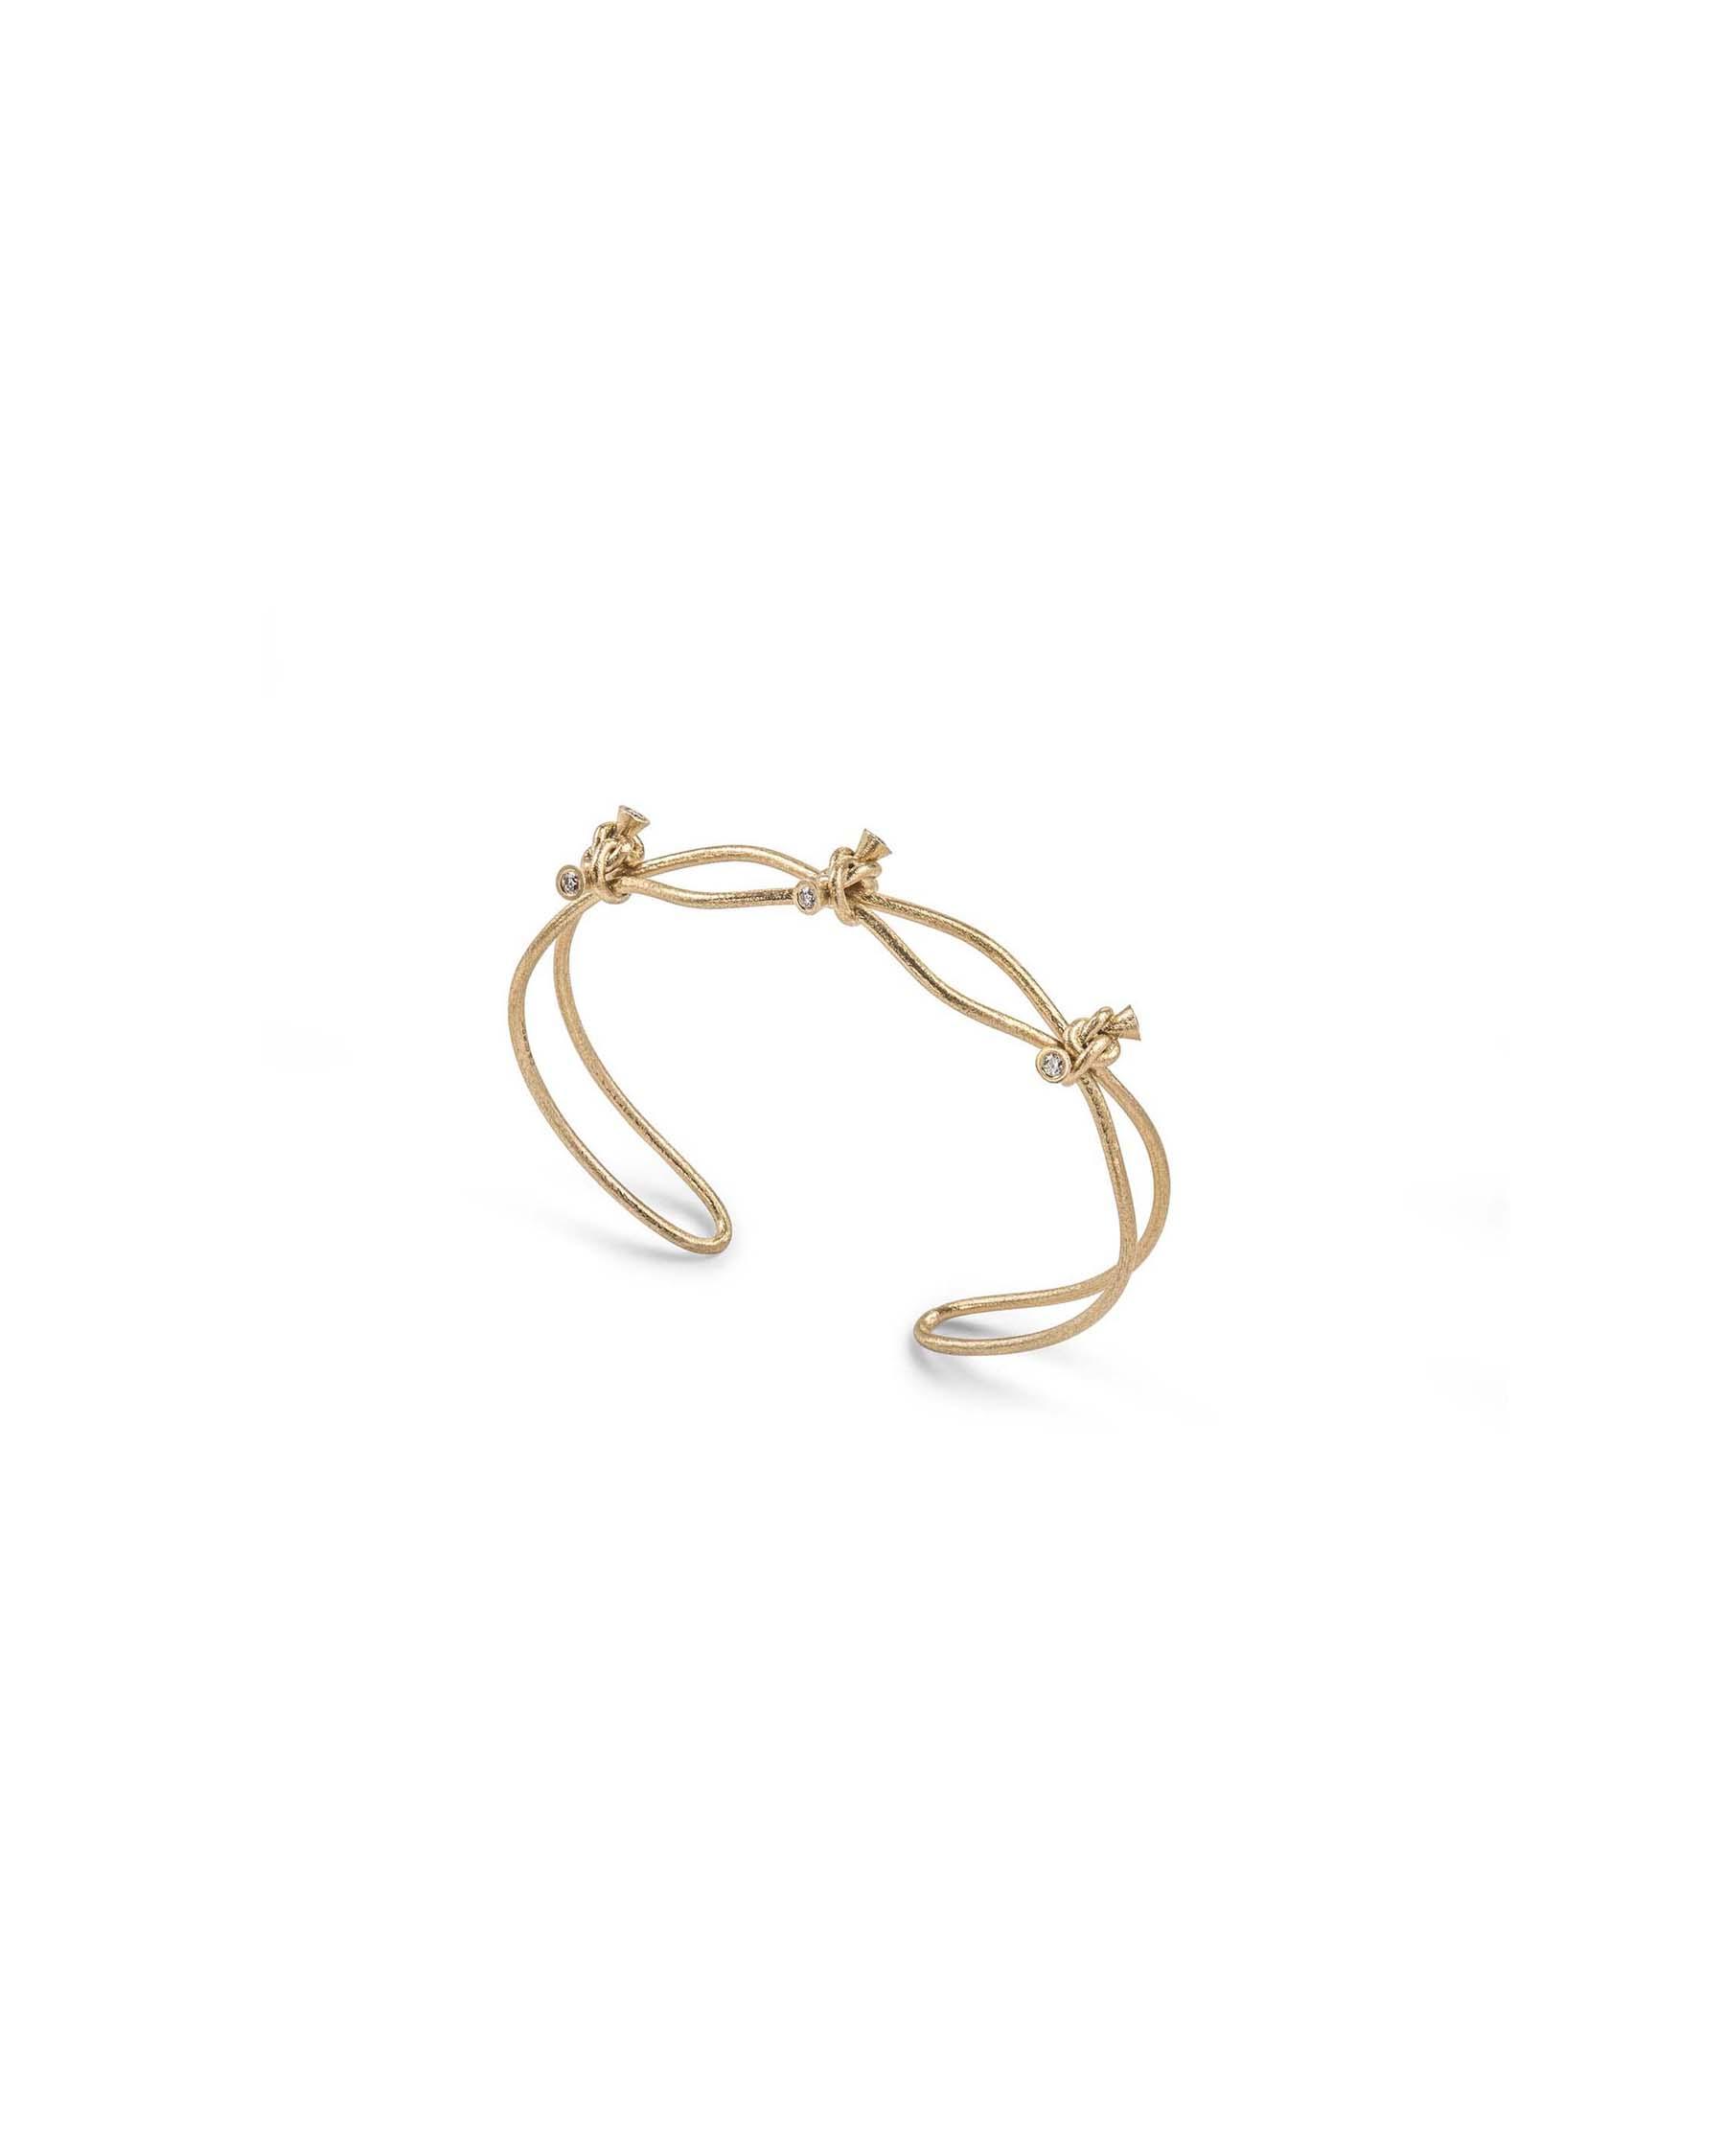 Triple knot bracelet